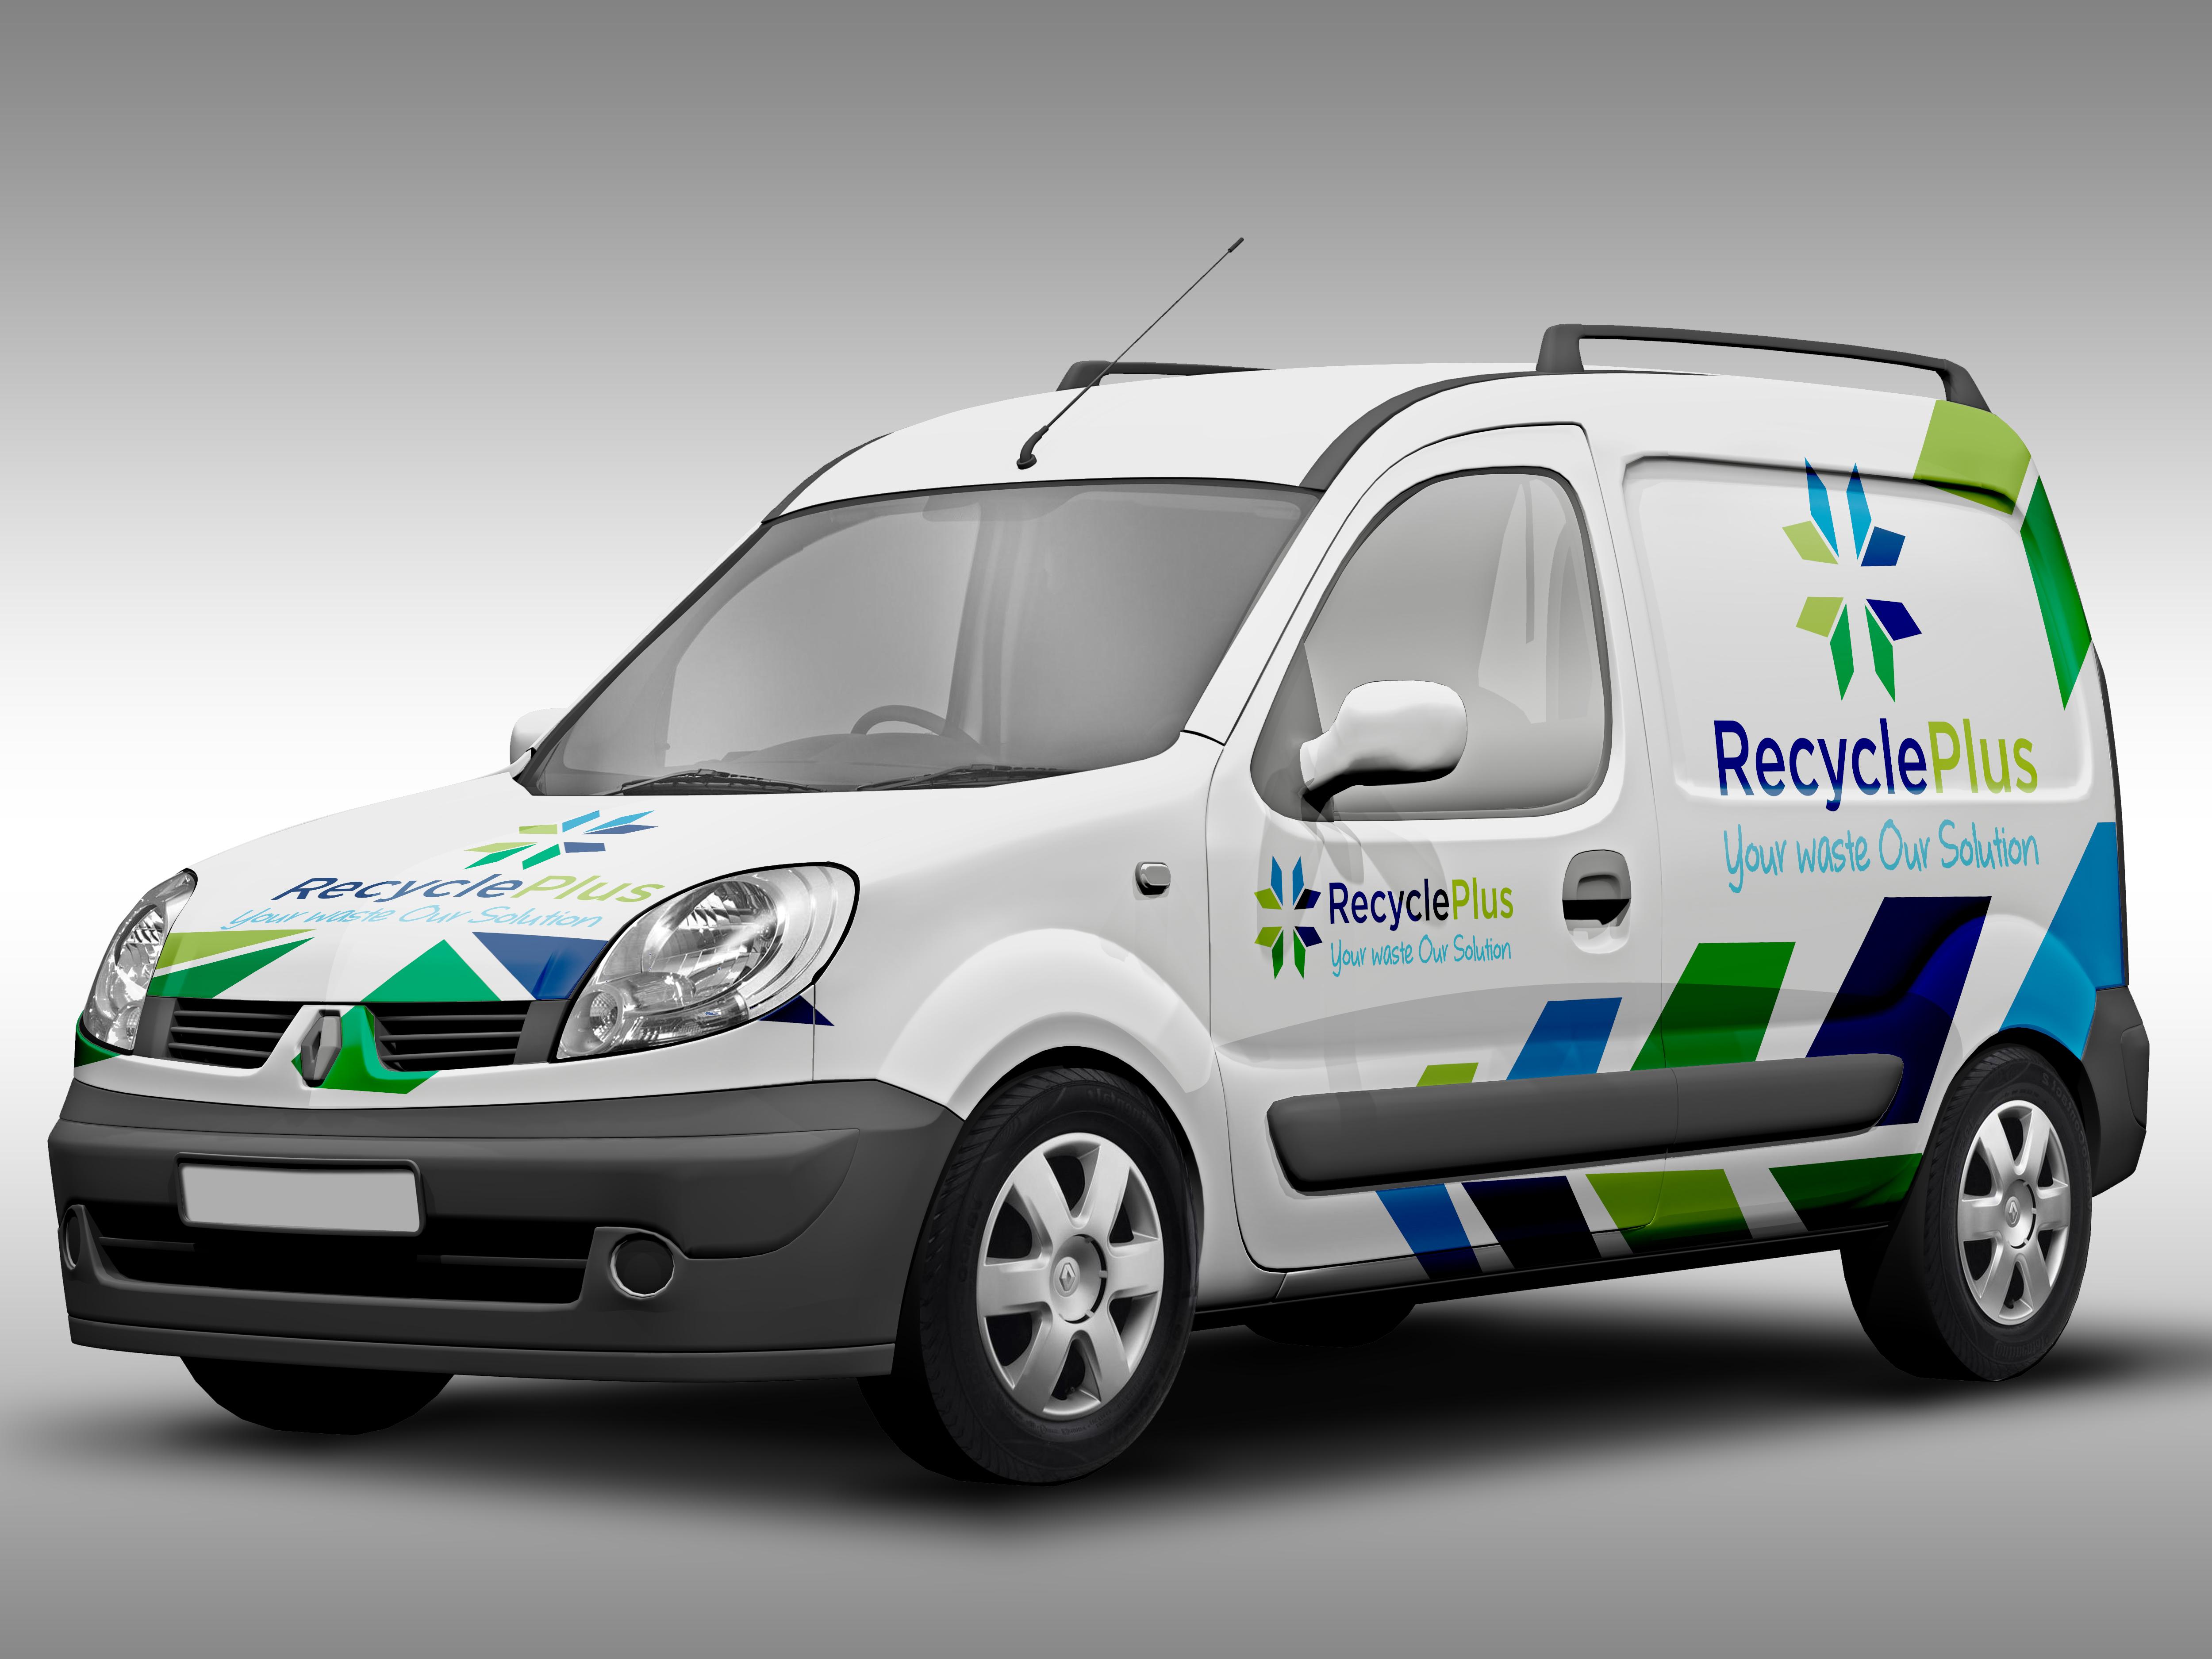 RP_Vehicle_Branding_Mockup